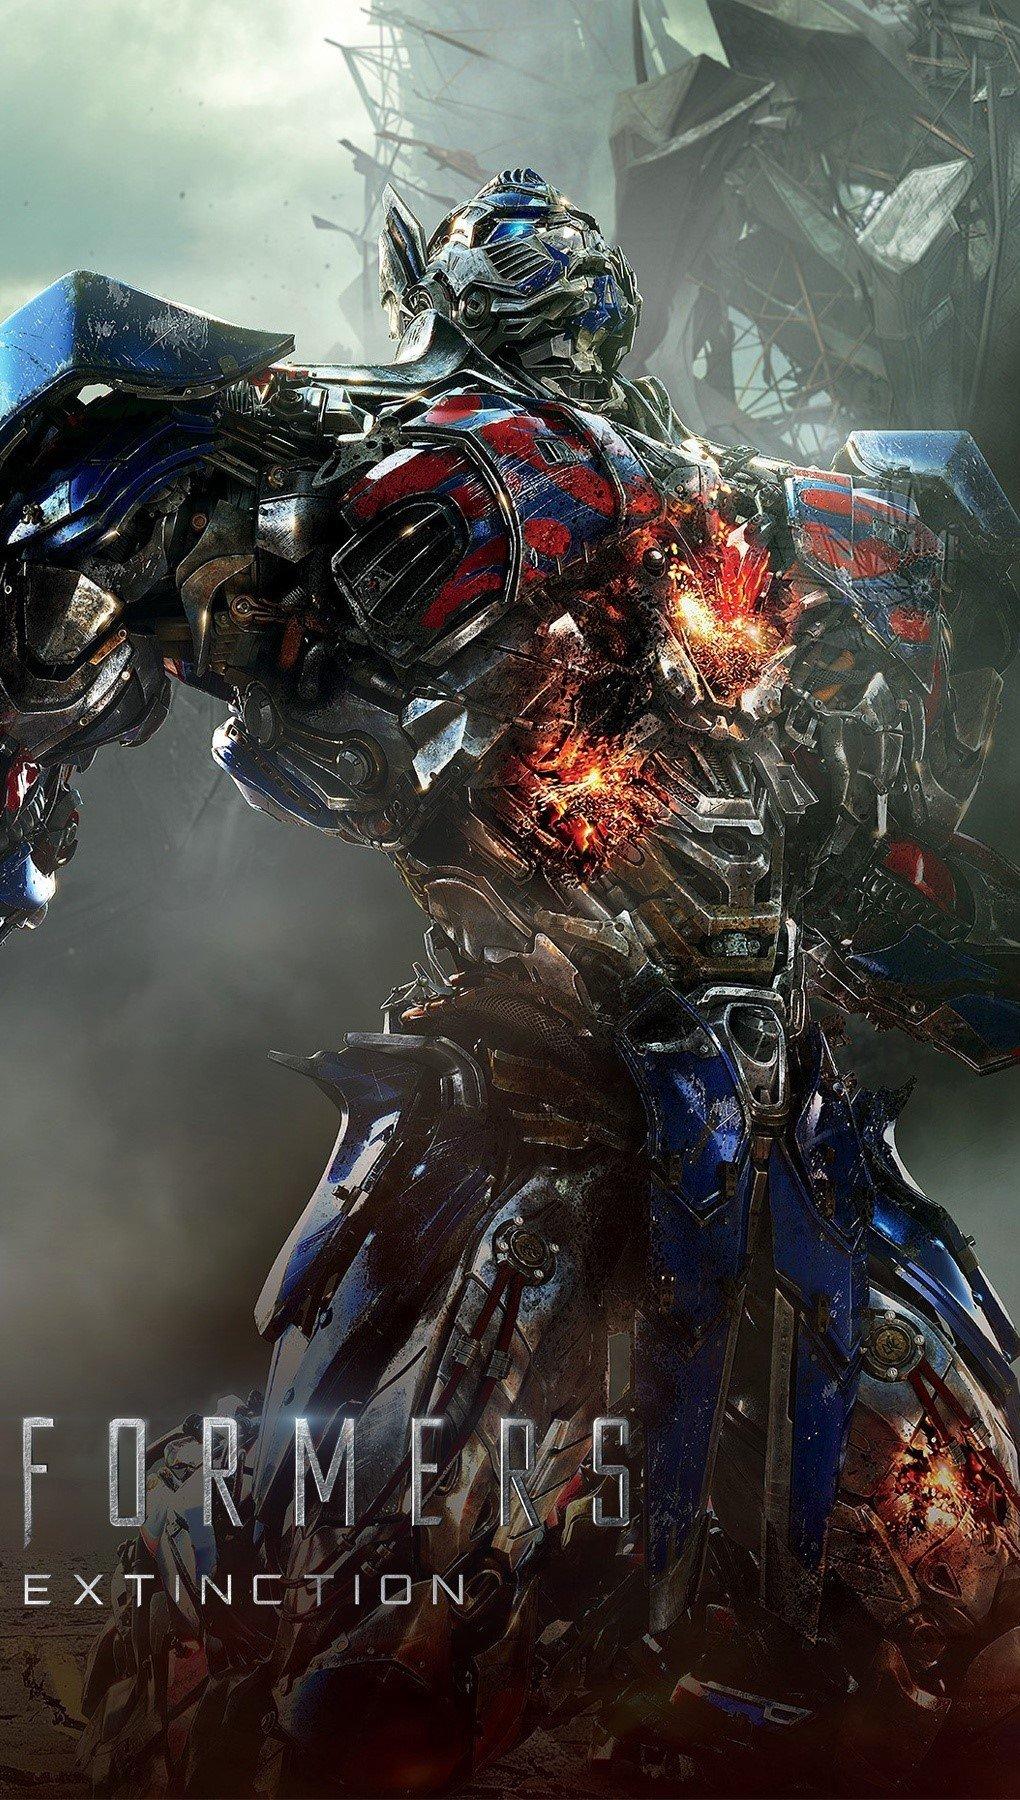 Fondos de pantalla Transformers 4 Age of extinction 2014 Vertical